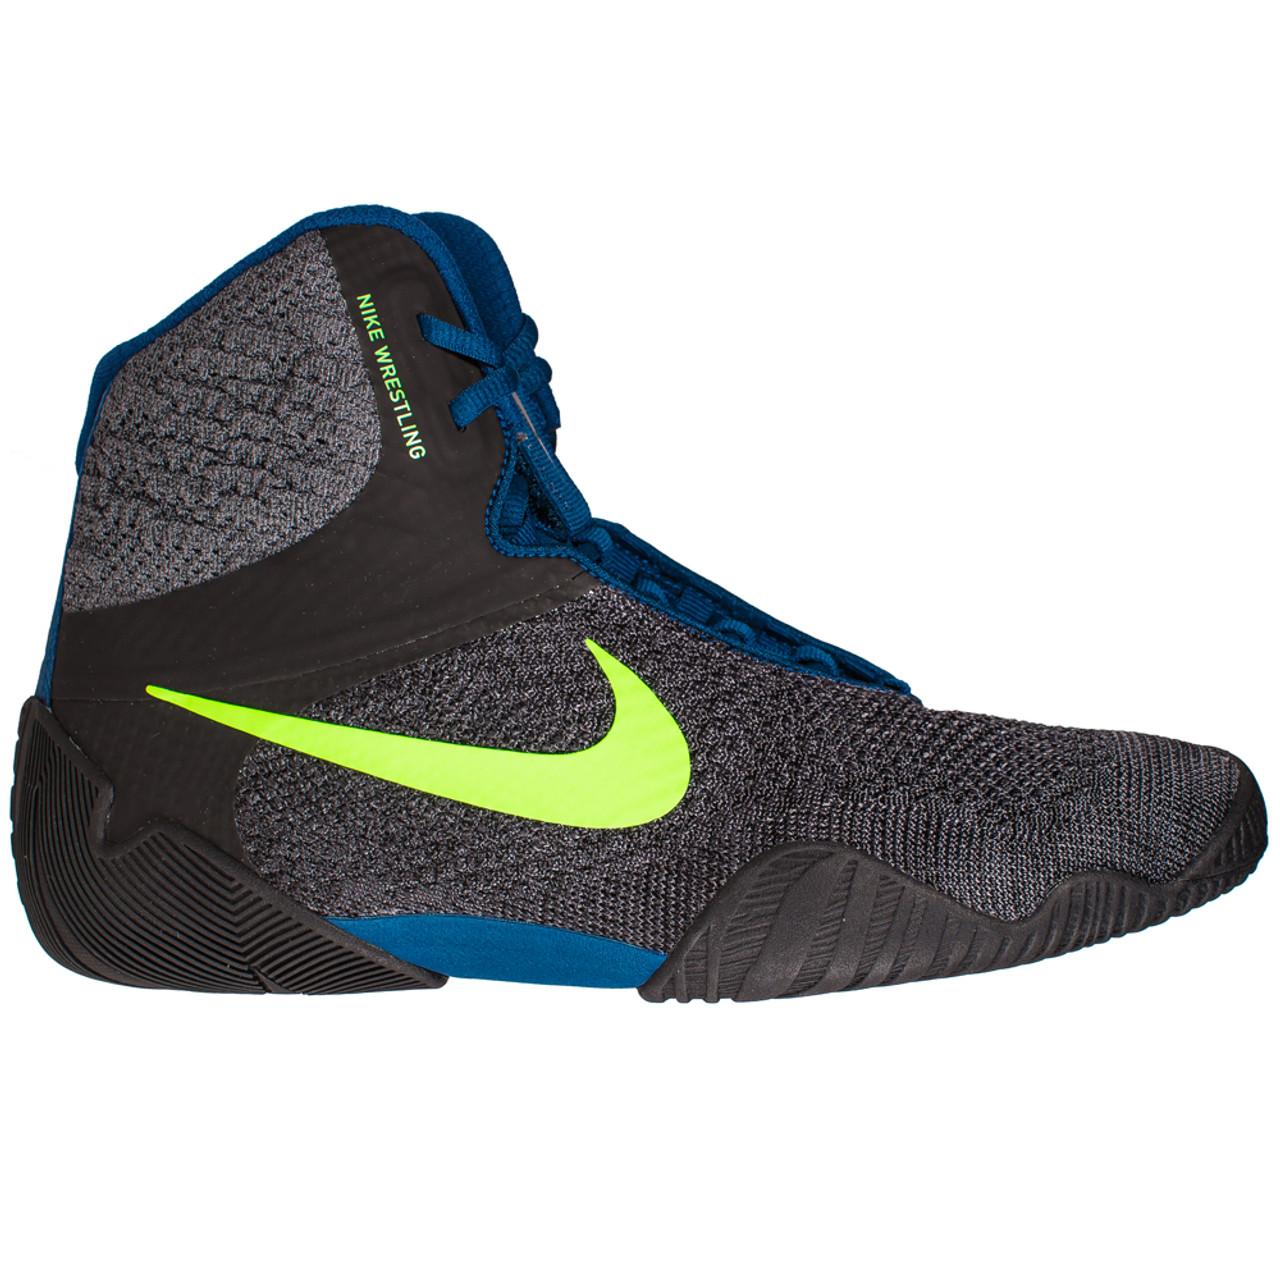 boys wrestling shoes size 13